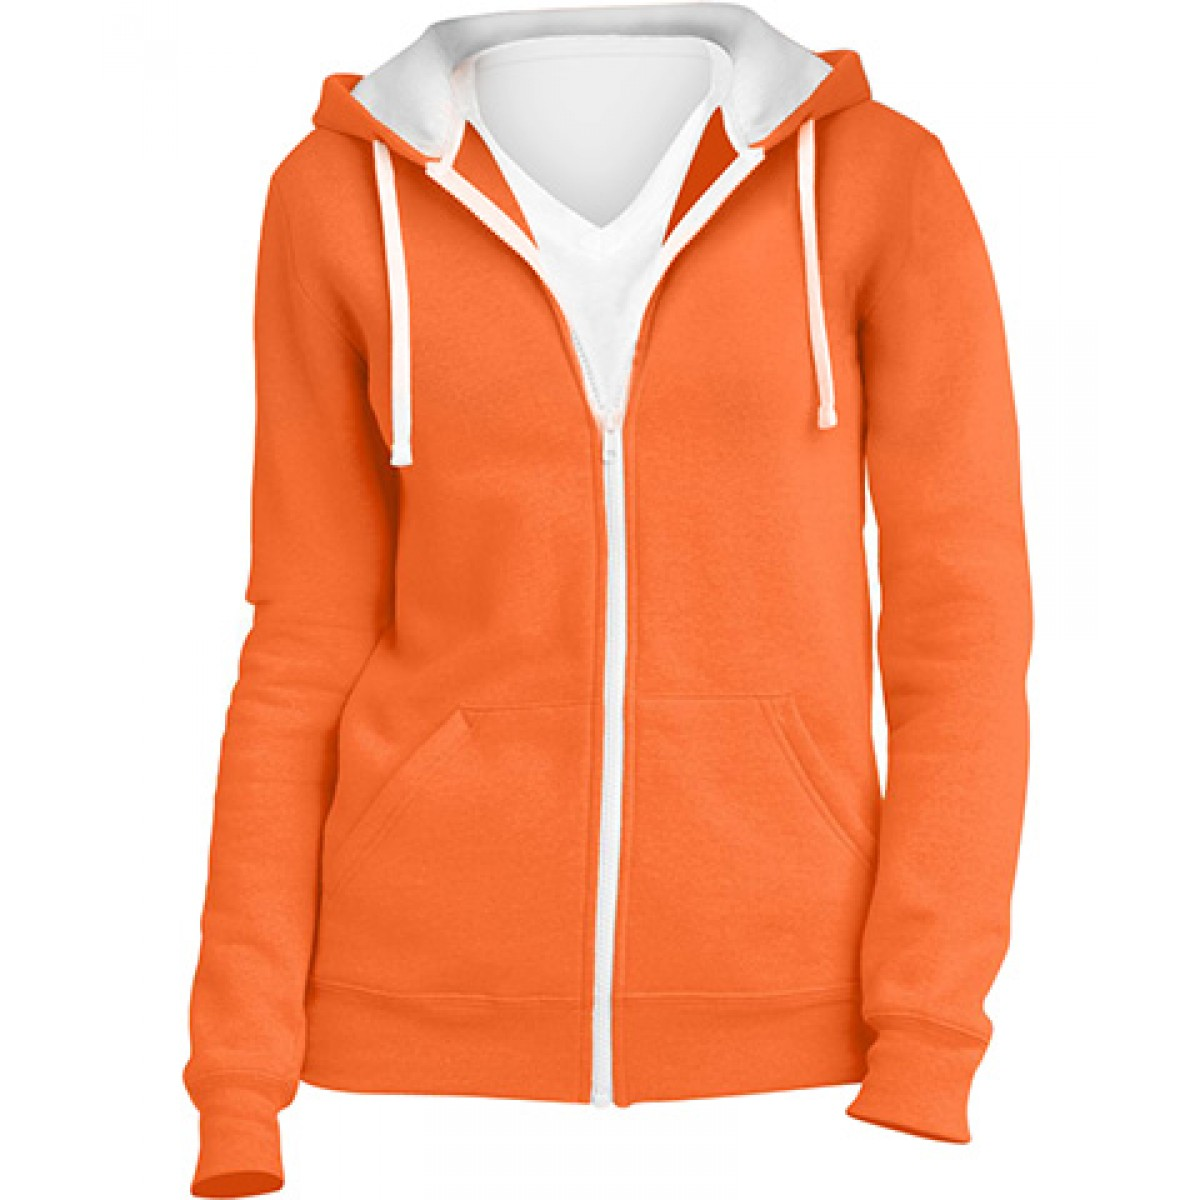 Juniors Full-Zip Hoodie-Neon Orange -M